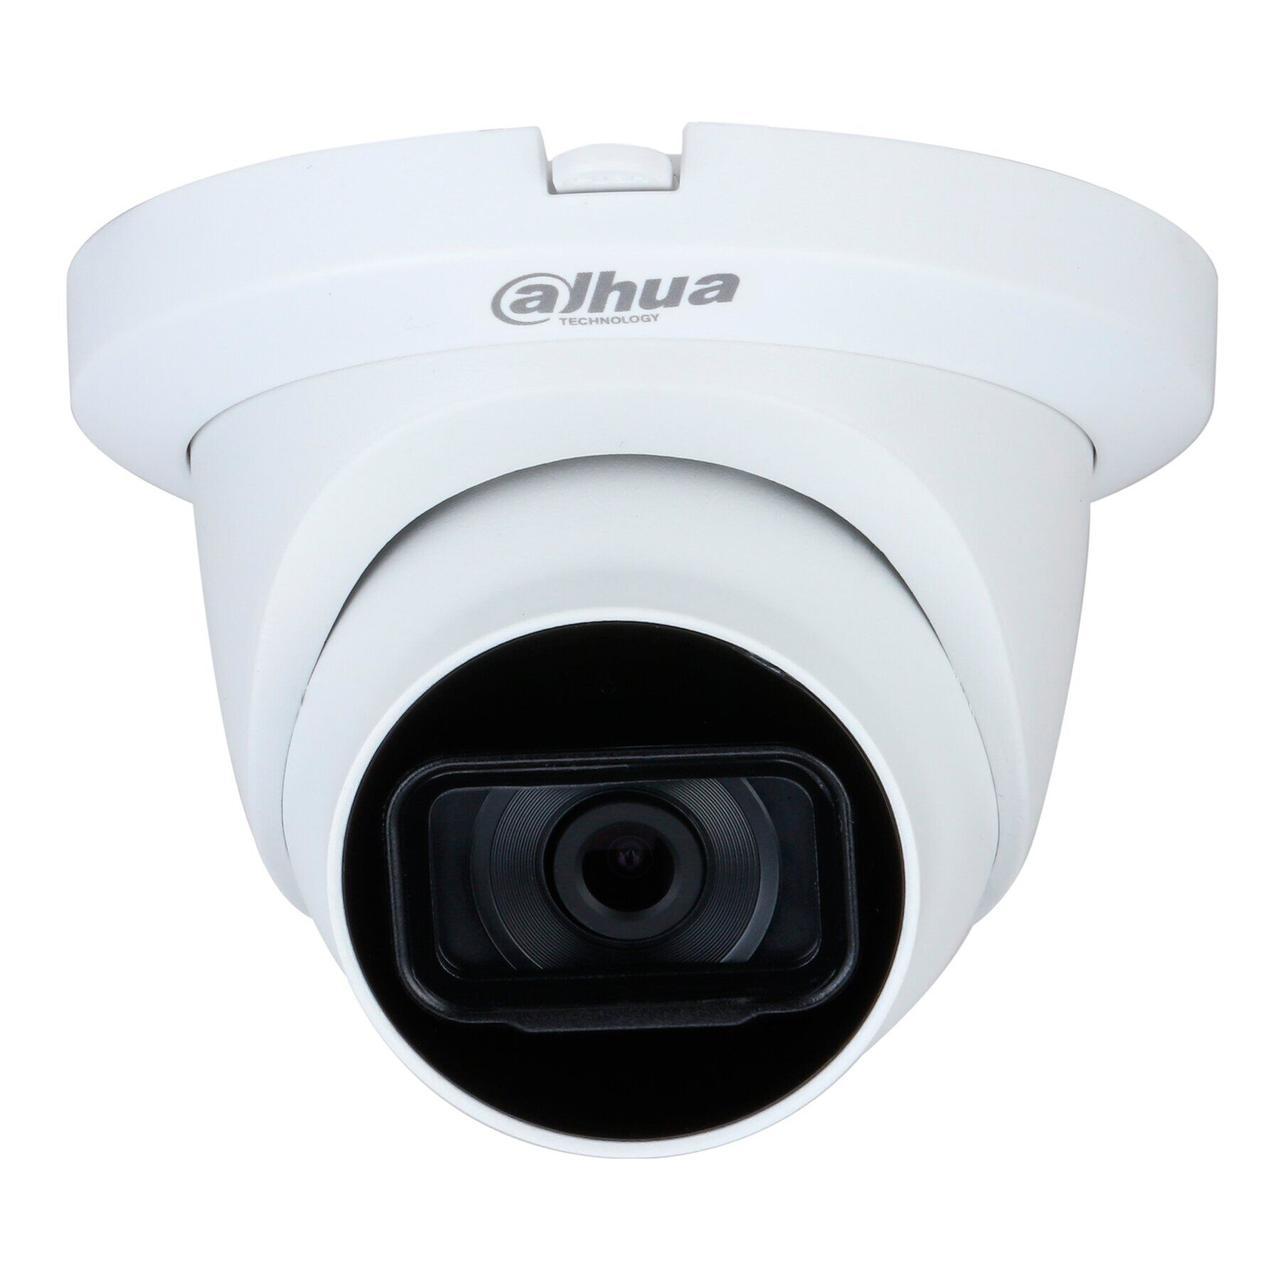 5 Мп Starlight HDCVI ИК камера Dahua DH-HAC-HDW2501TMQP-AНет в наличии